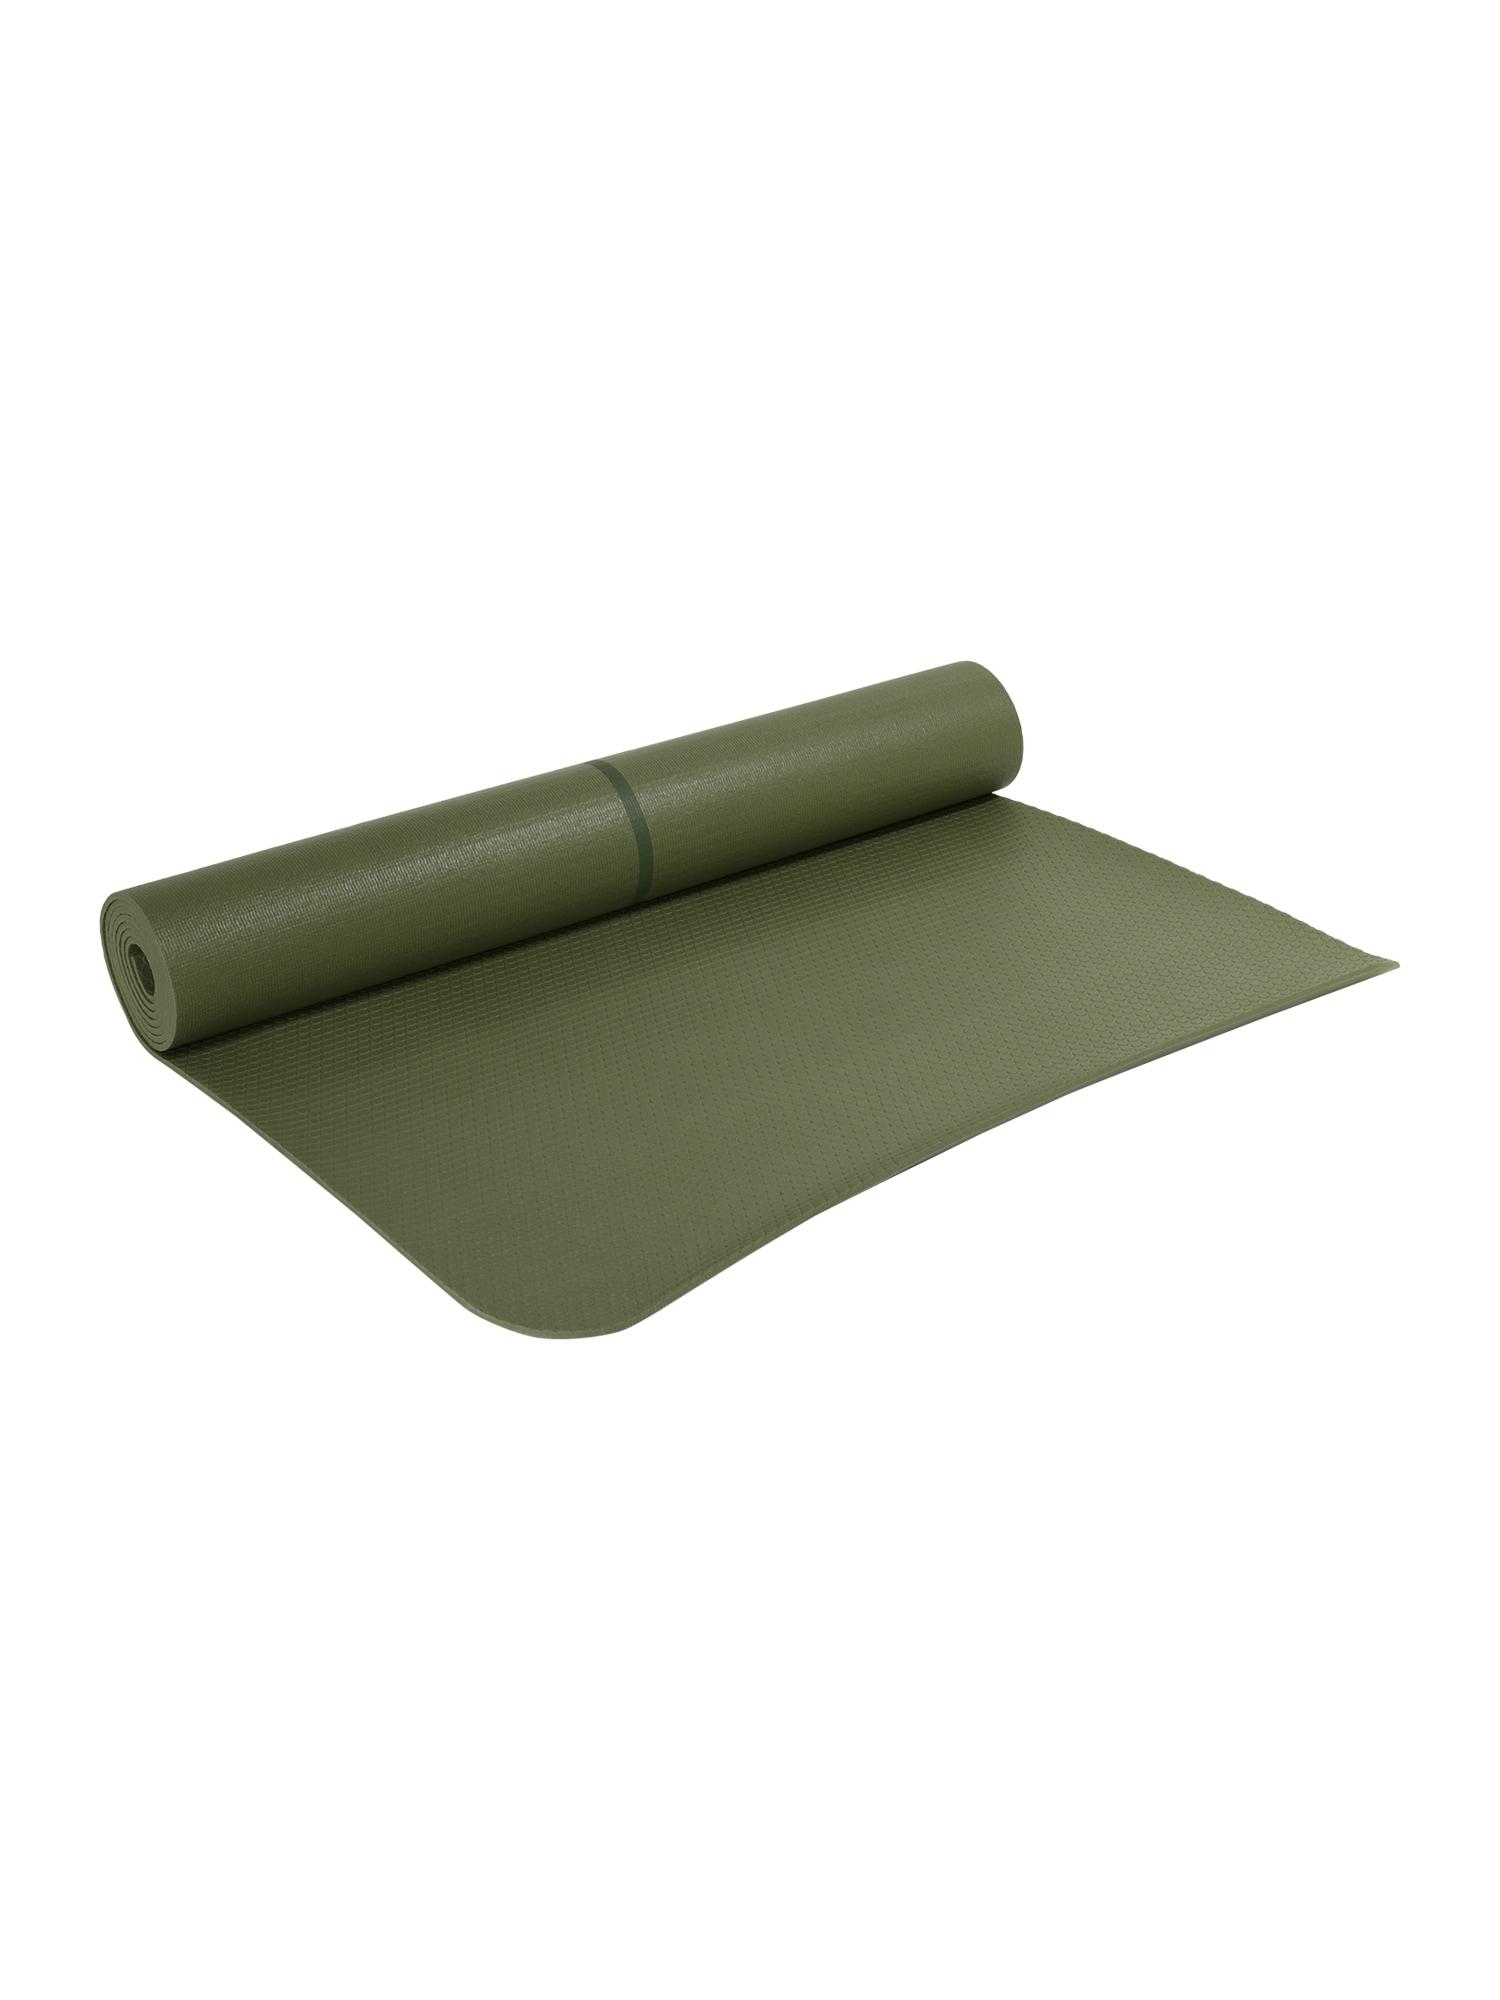 bahé yoga Kilimėlis alyvuogių spalva